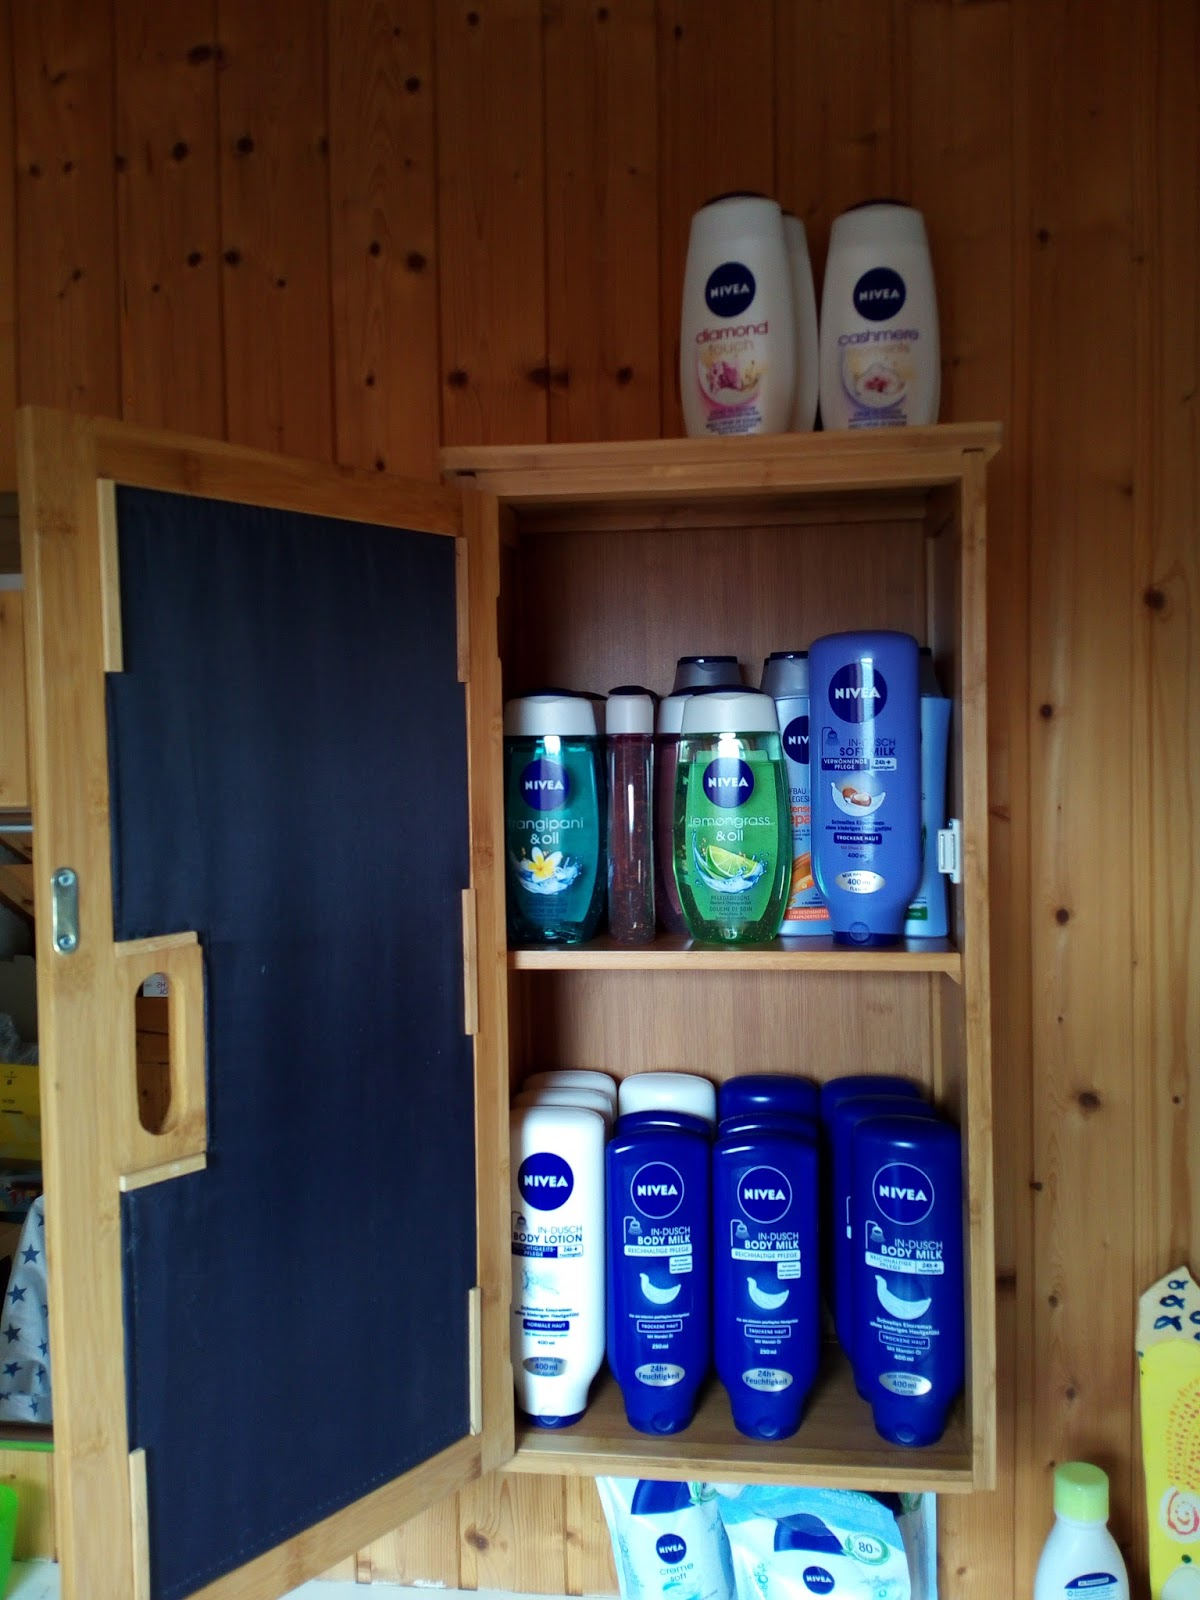 Relaxdays badezimmerschrank aus bambus - Badezimmerschrank bambus ...